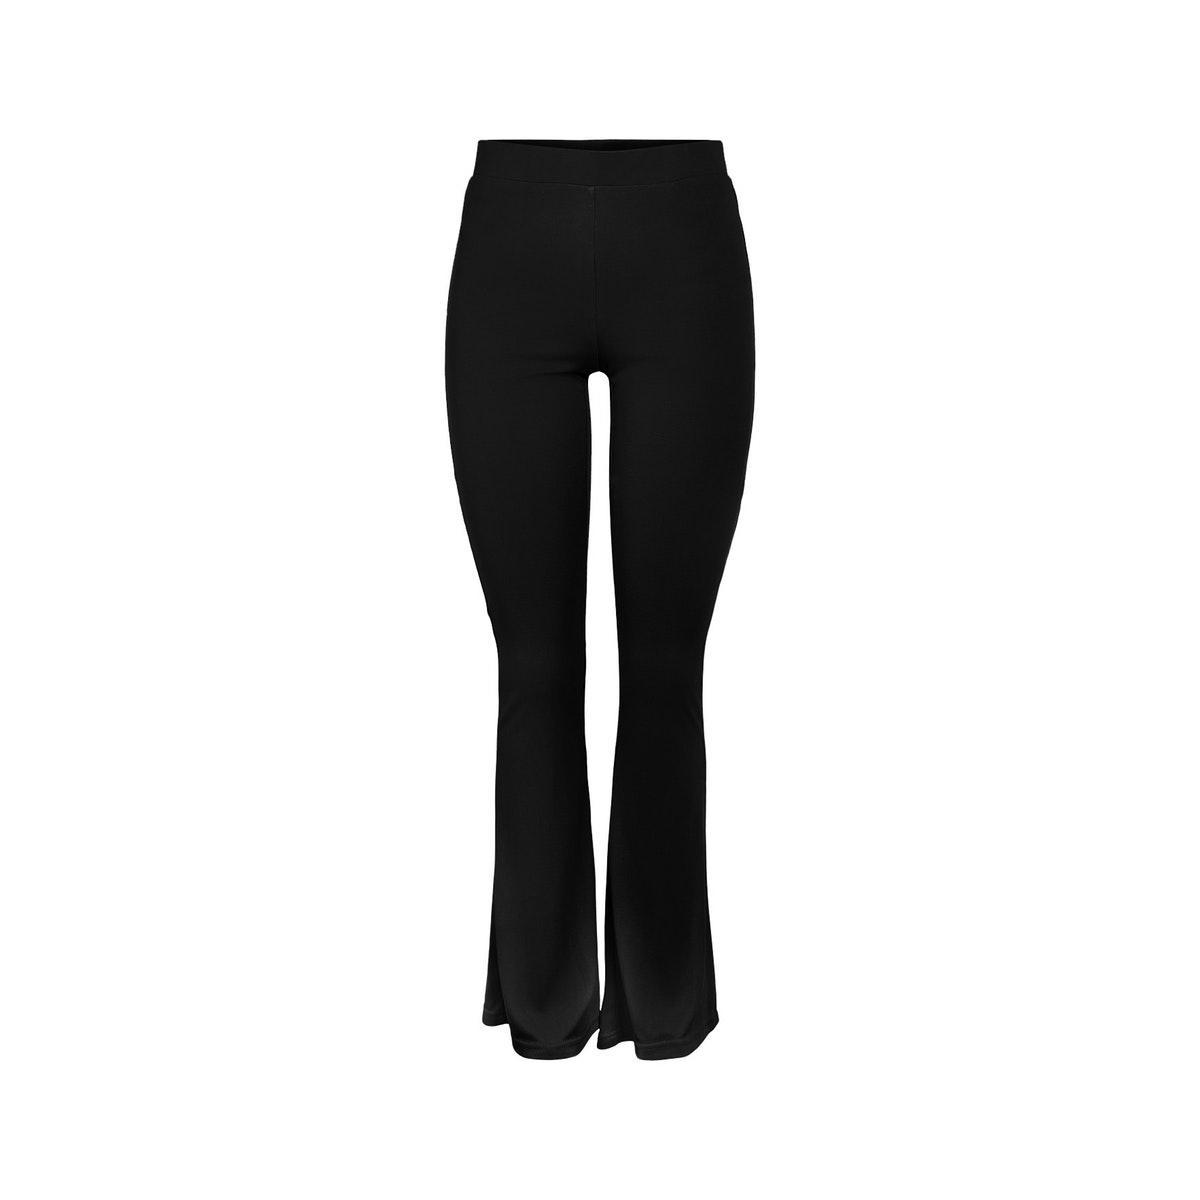 pcnukita mw flared pants 17102009 pieces broek black